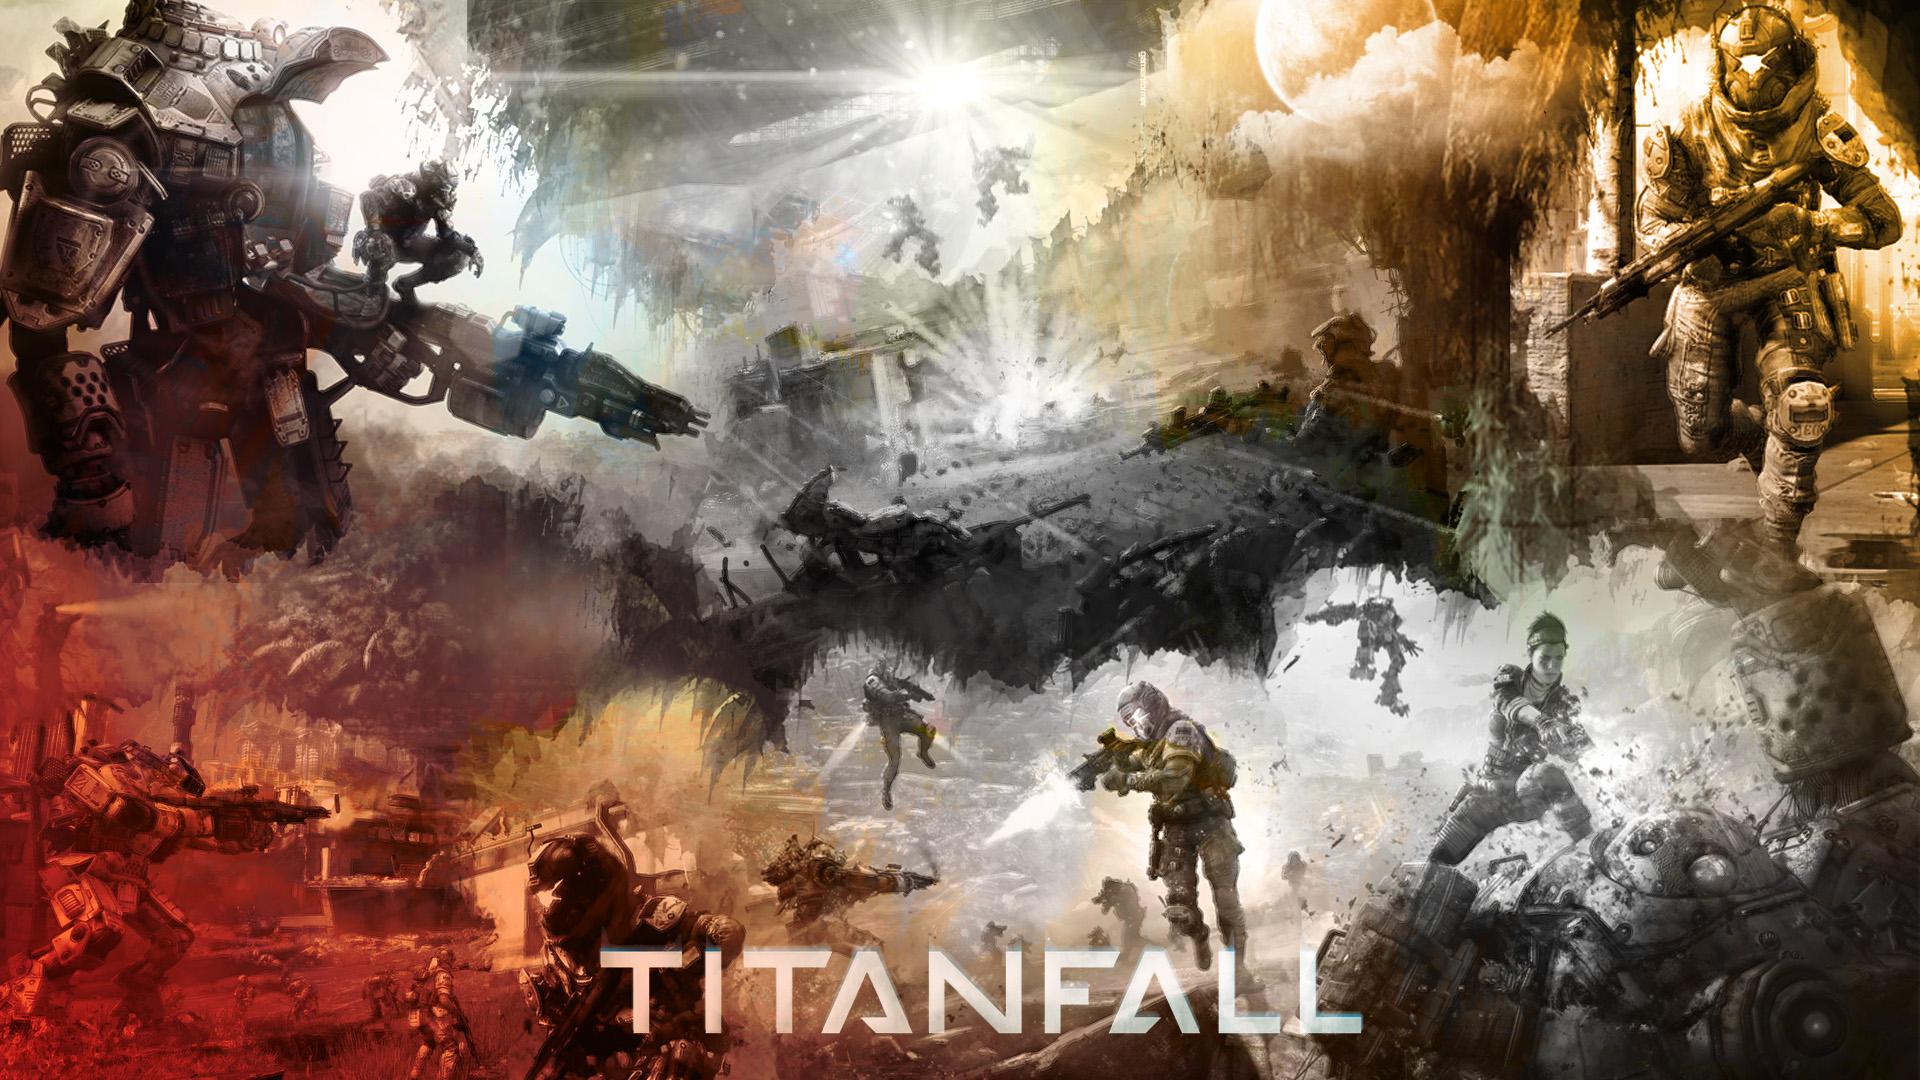 Titanfall wallpaper by psygnos1s on deviantart - Epic titanfall 2 wallpapers ...